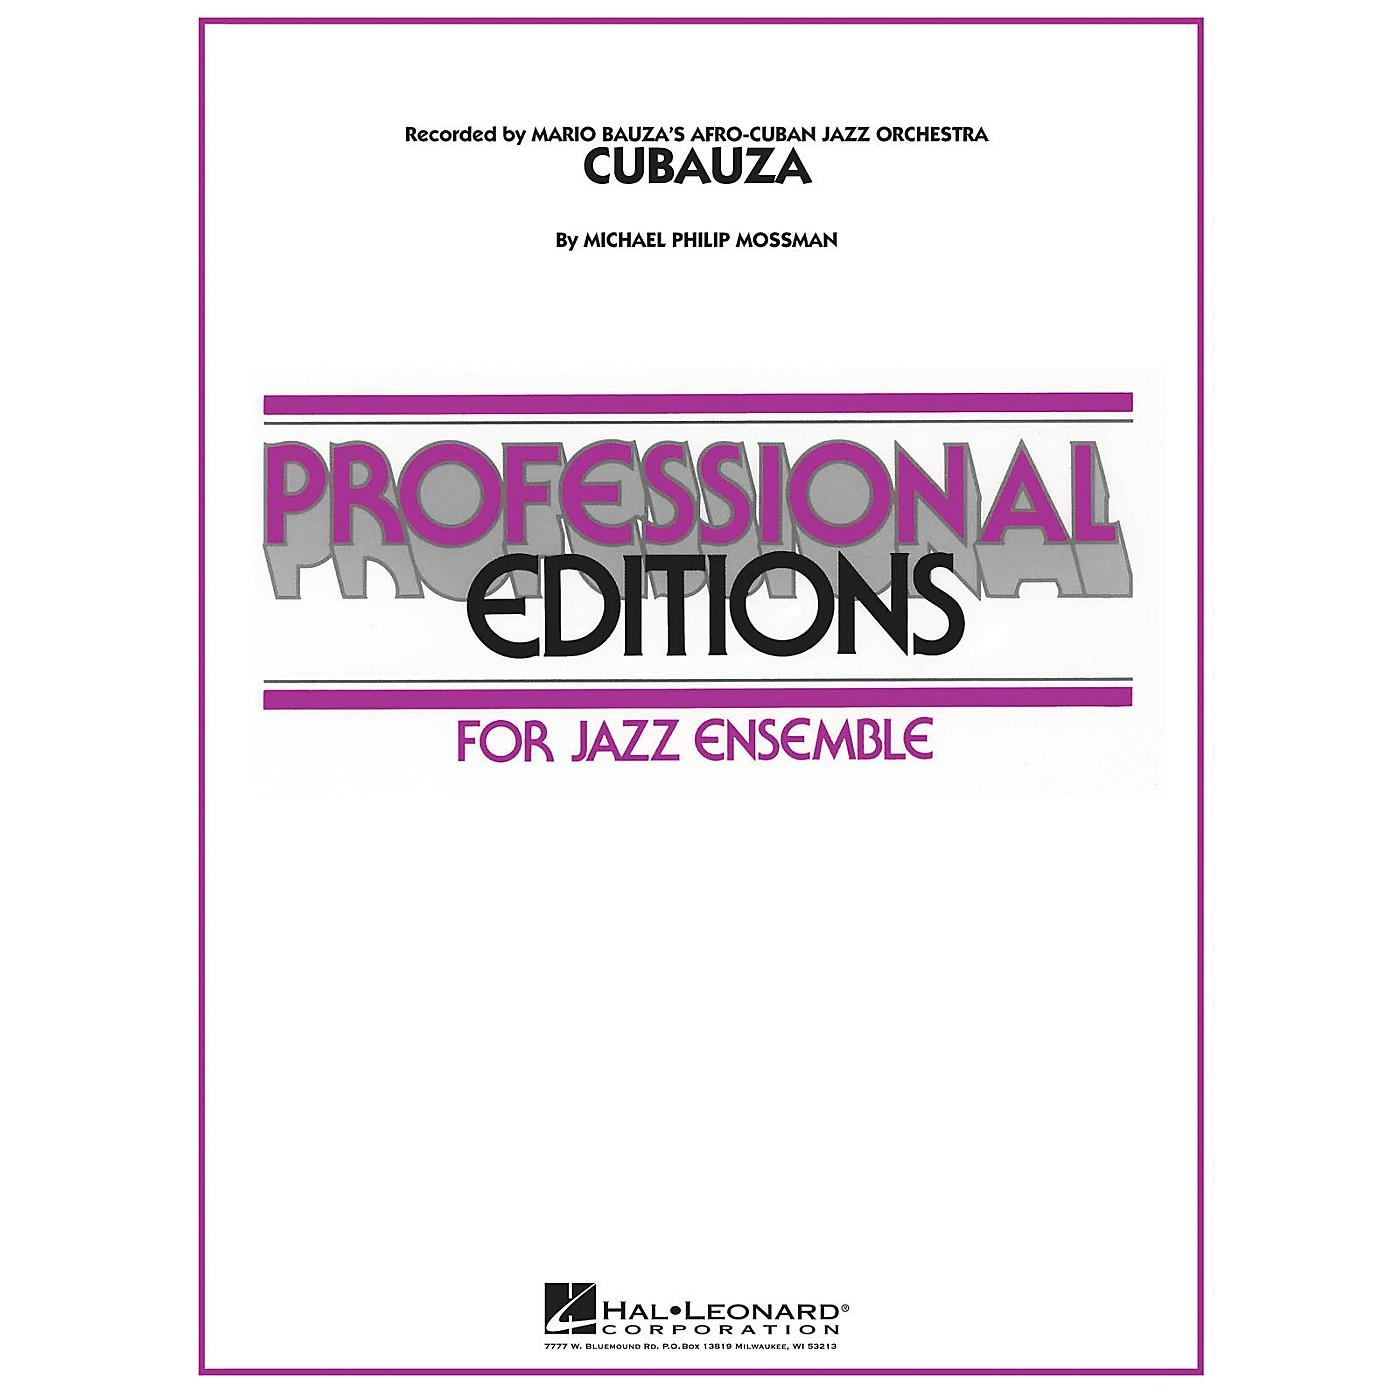 Hal Leonard Cubauza Jazz Band Level 5 by Mario Bauza Composed by Michael Philip Mossman thumbnail